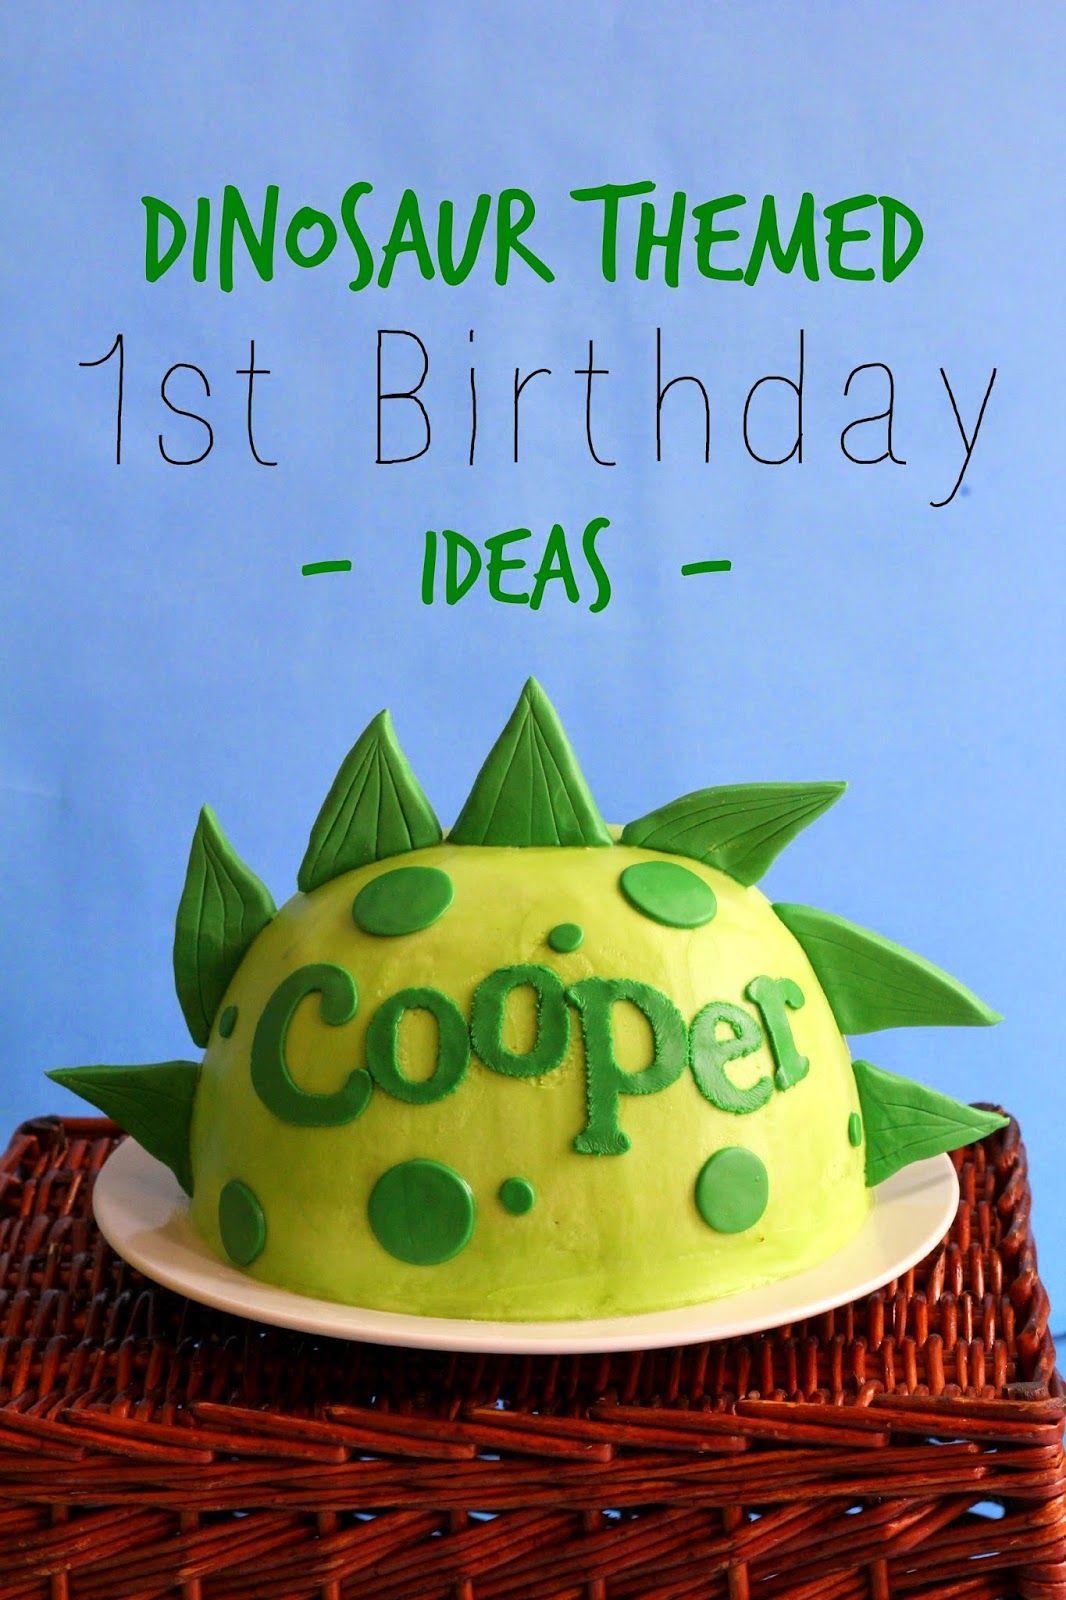 Dinosaur Themed First Birthday Party Ideas Birthday party ideas